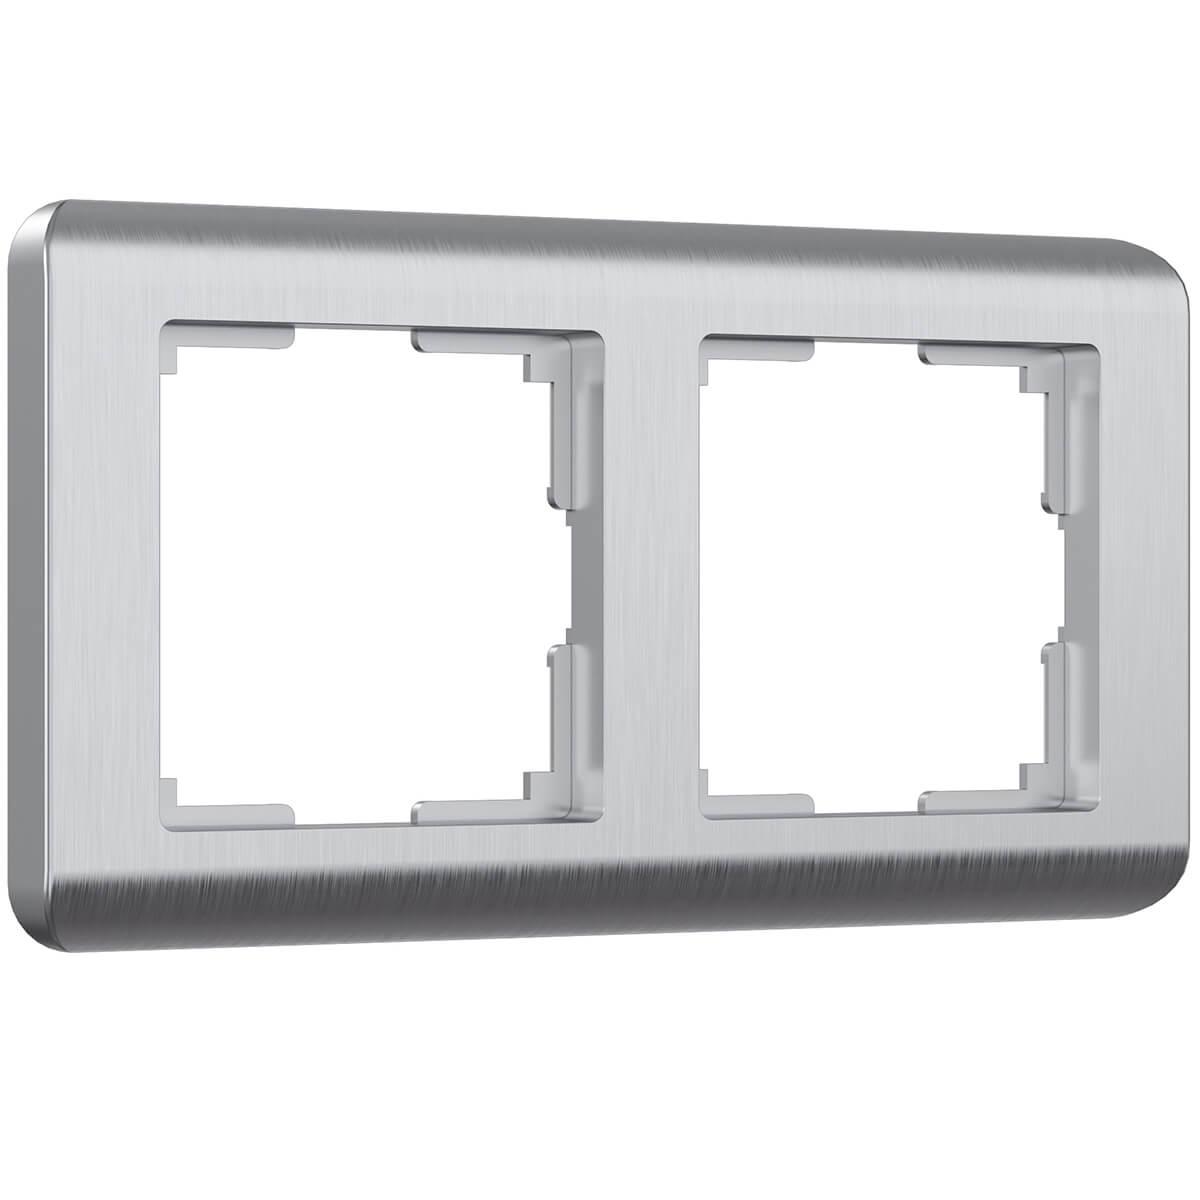 цена Рамка Stream на 2 поста серебряный WL12-Frame-02 4690389076374 онлайн в 2017 году